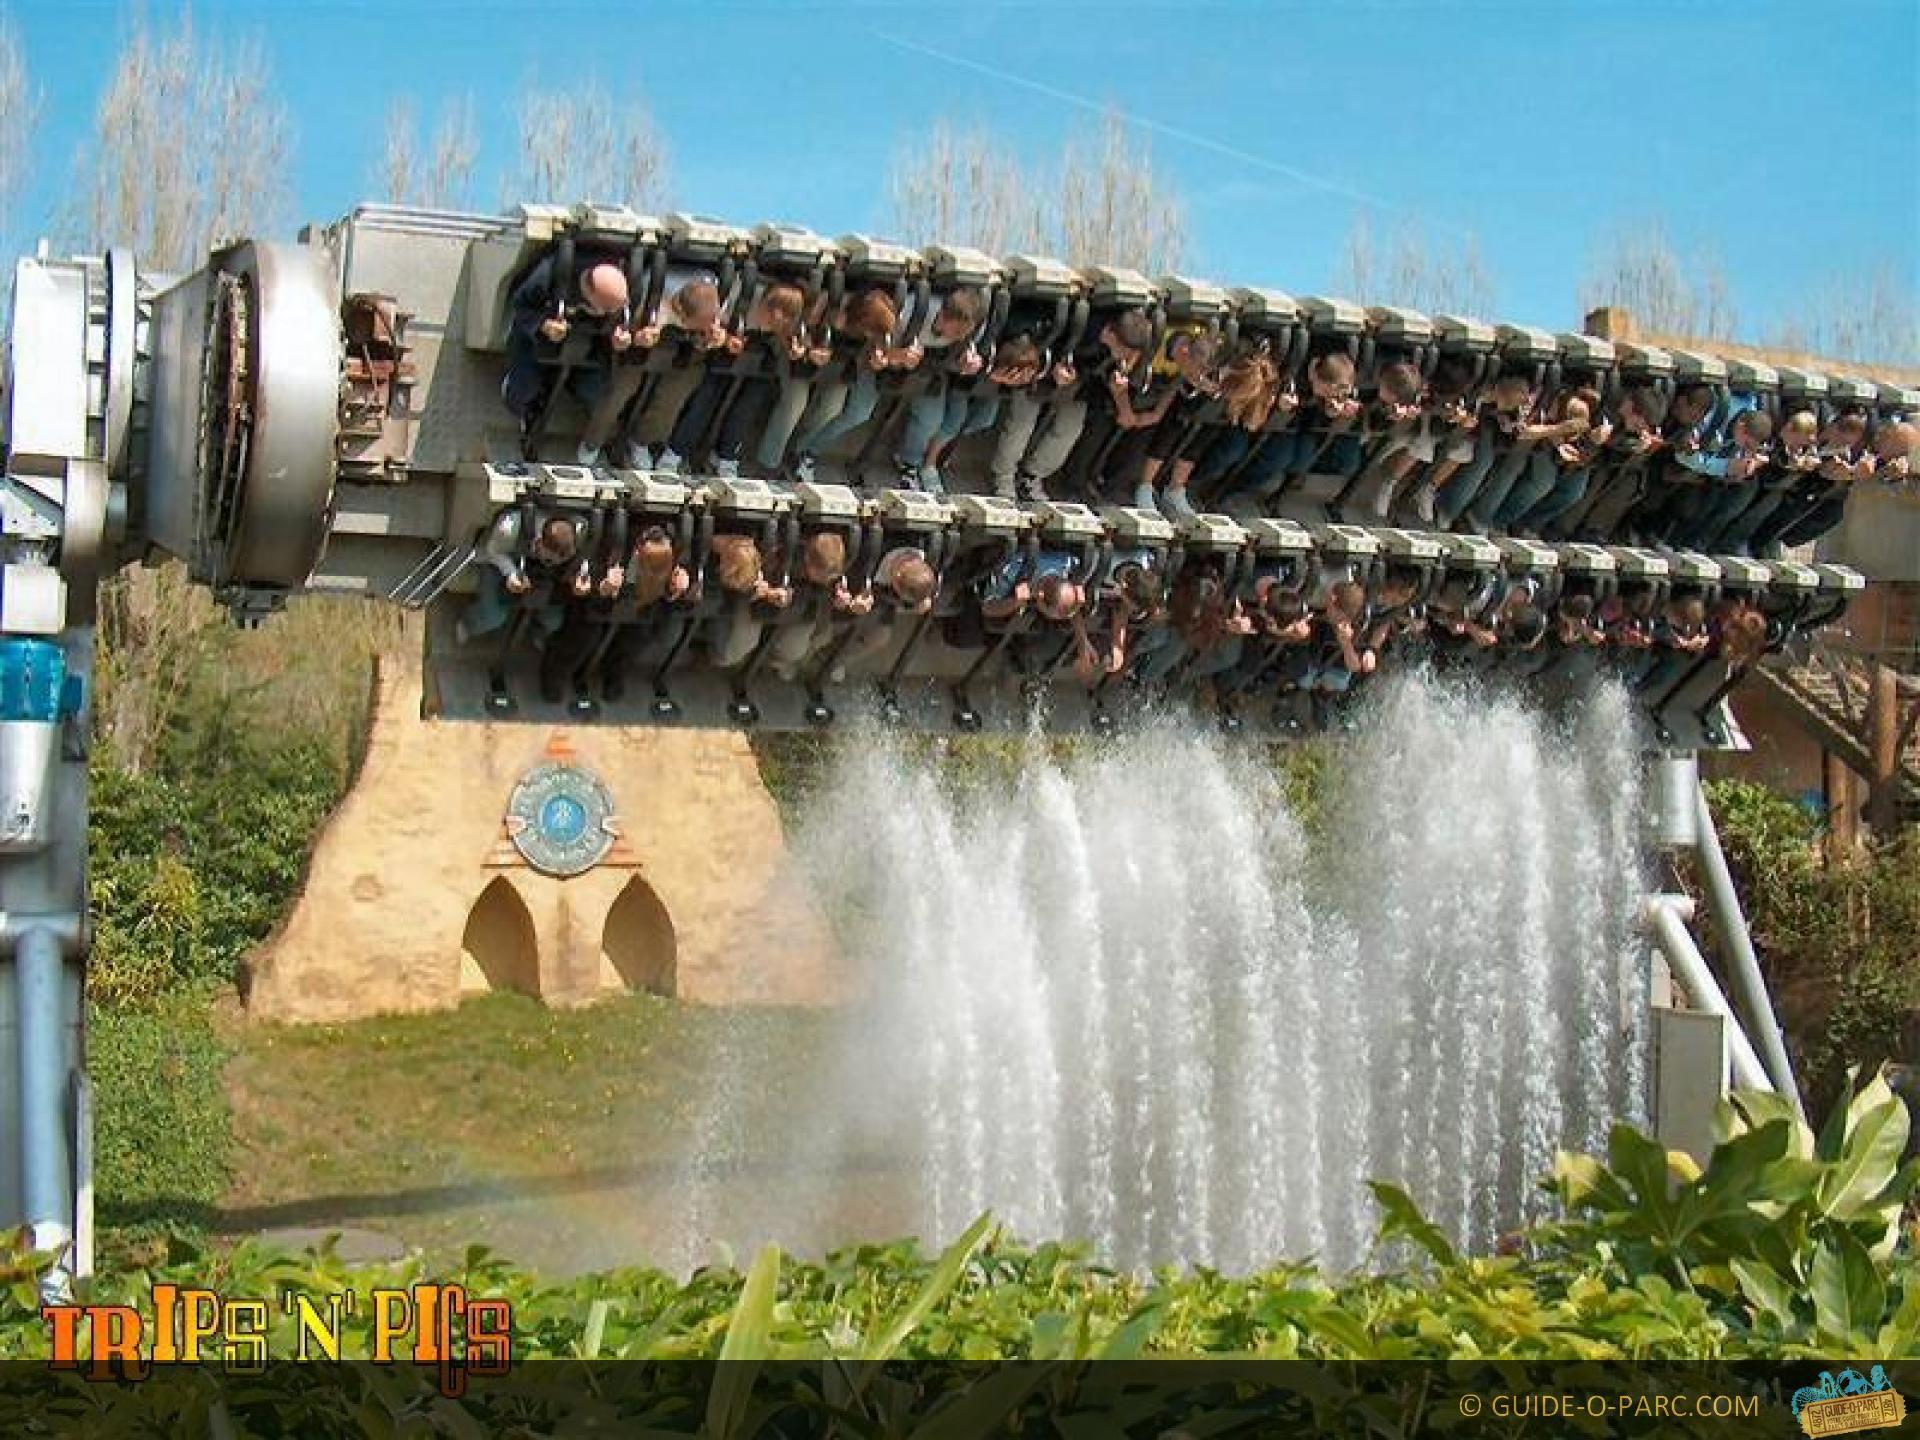 ThemeParkAmazing | Rollercoaster Enthusiasts🎢 Amino